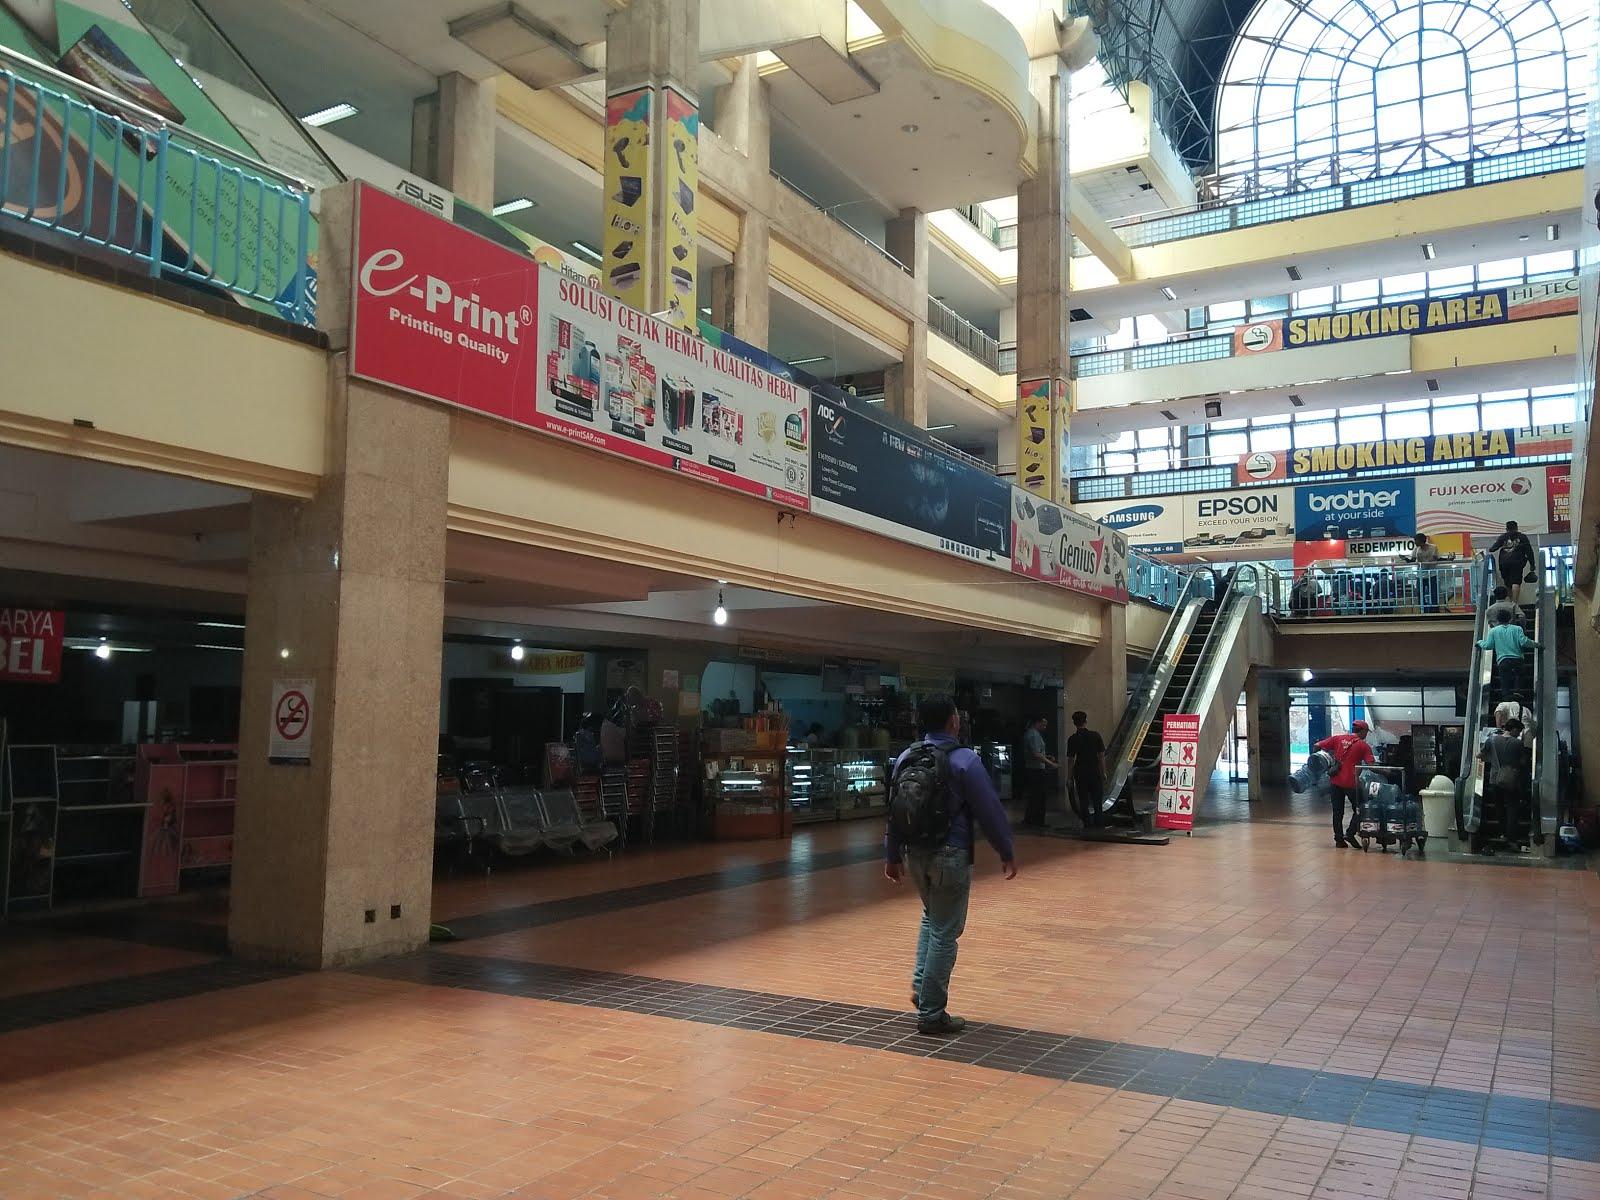 hi-tech mall, surga belanja, elektronik, komputer, surga belanja surabaya, dolan dolen dolaners hi tech mall via saphiretravel - Dolan Dolen